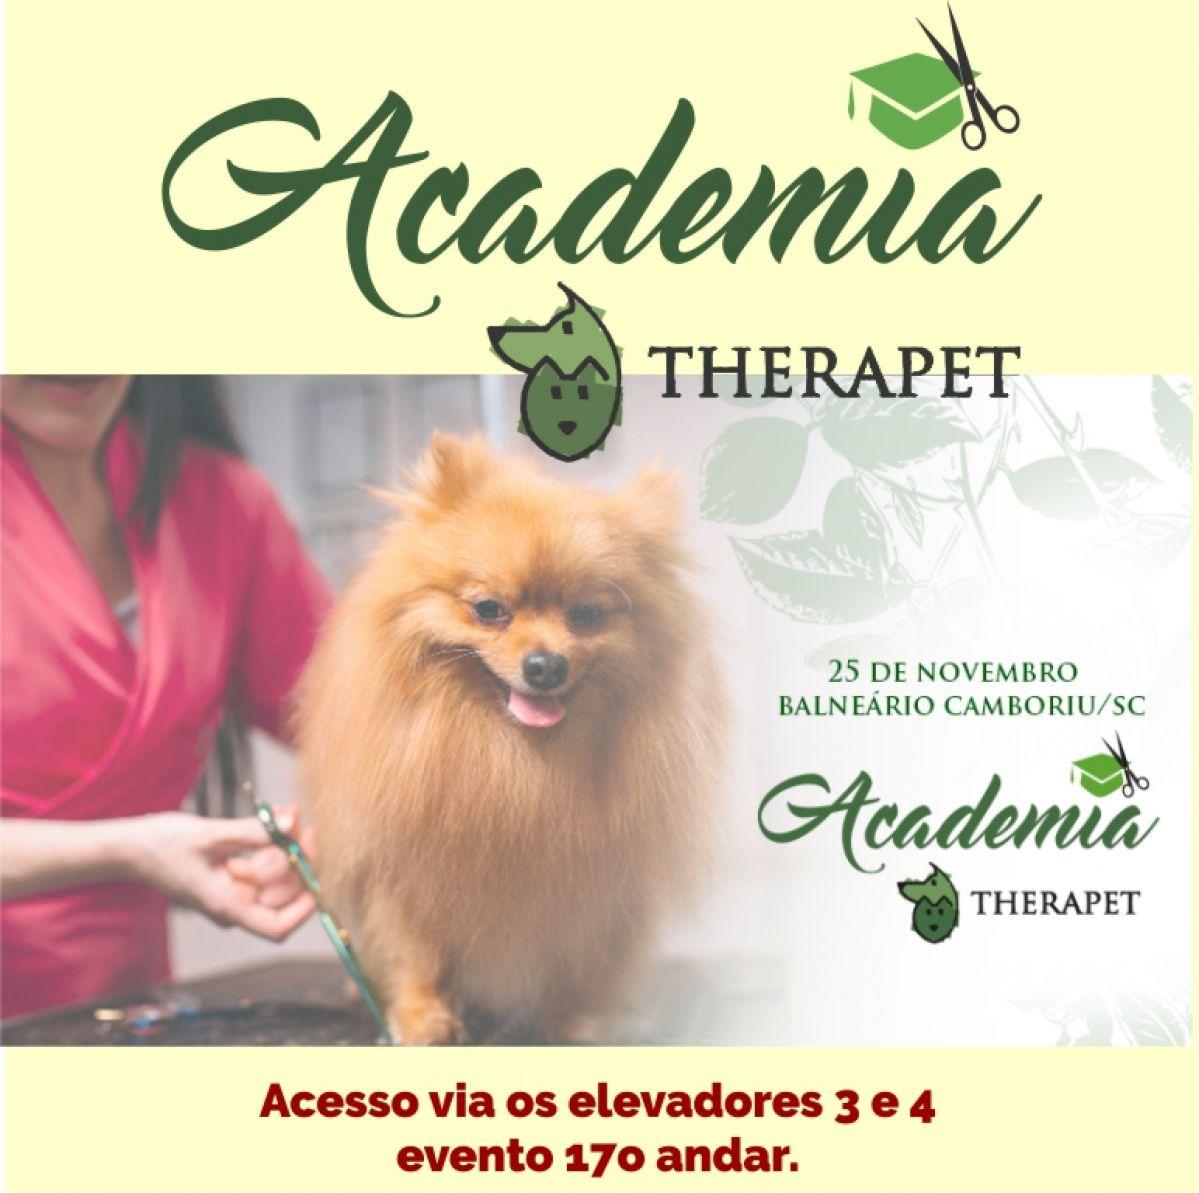 Academia Therapet